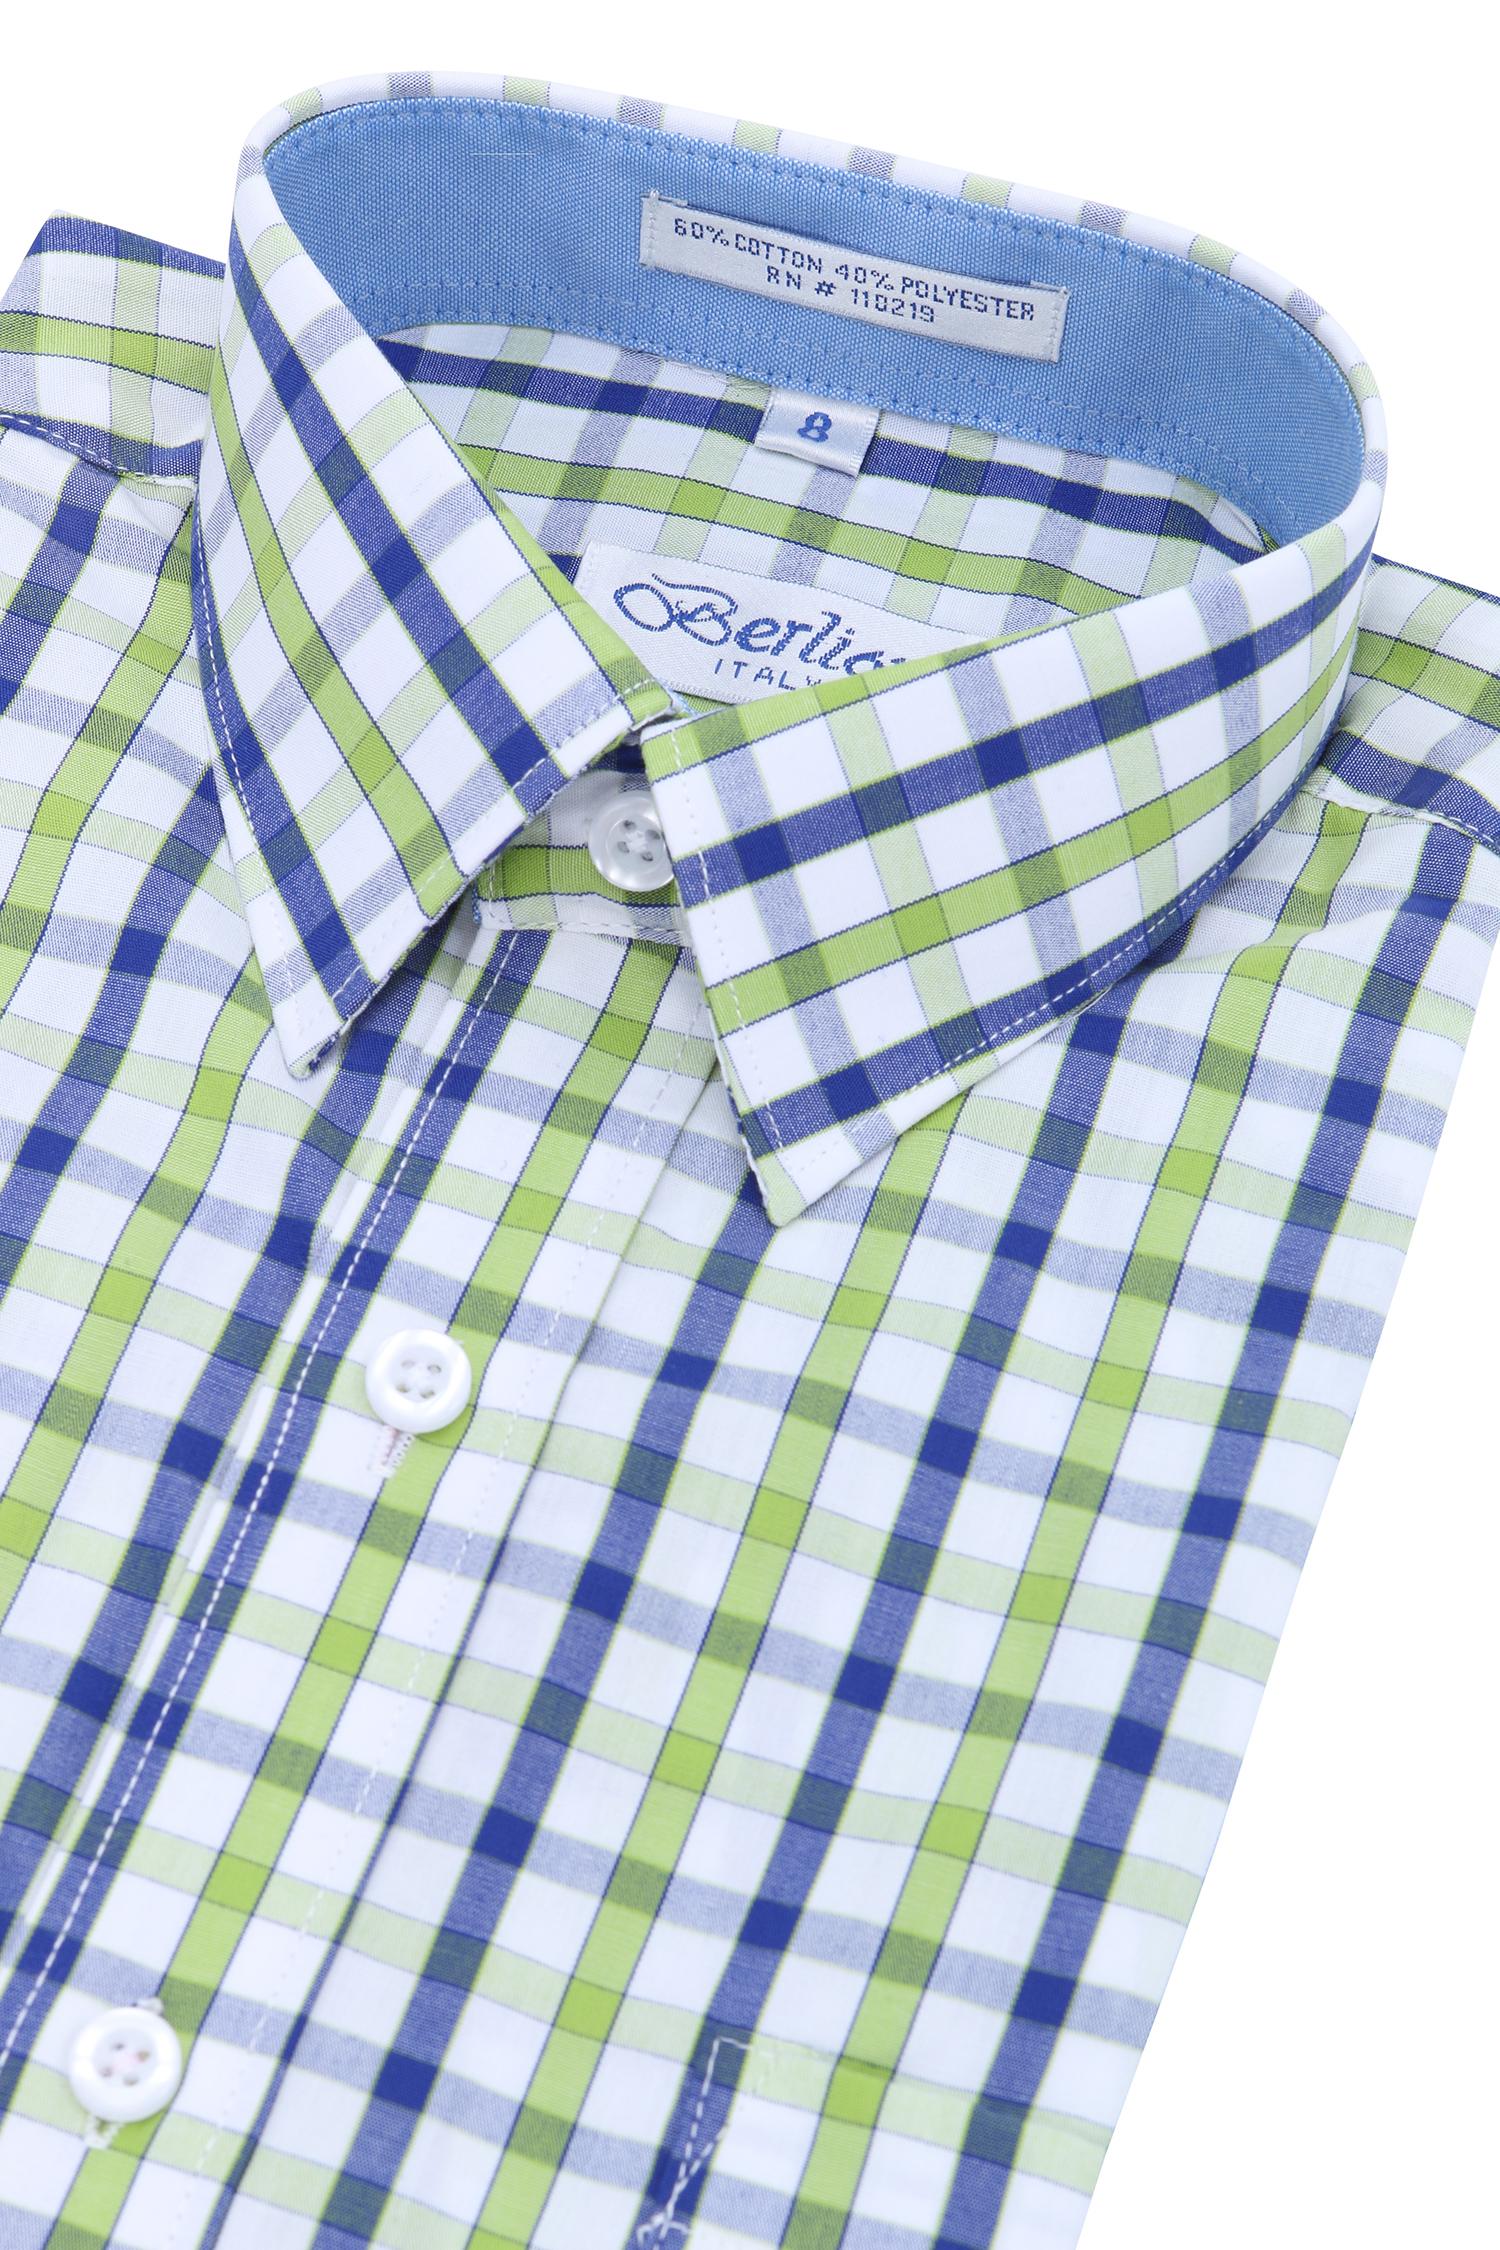 Berlioni Son shirts-green-4.jpg